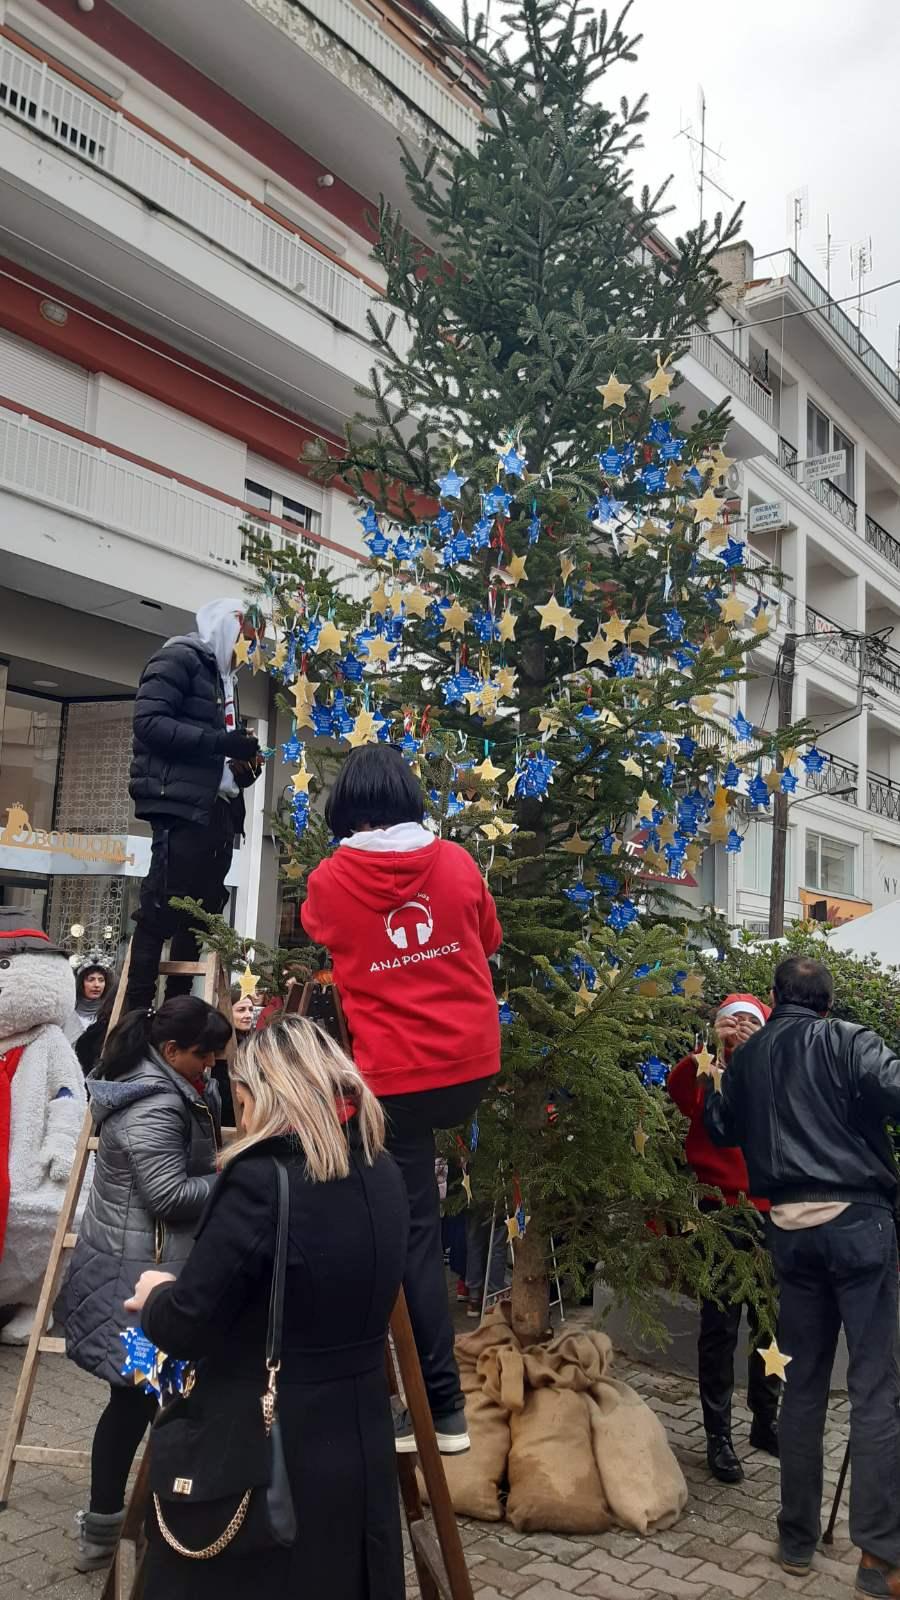 kozan.gr: Πτολεμαΐδα: Έτοιμο το «Δένδρο των Ευχών»στη συμβολή του πεζόδρομου Περδίκκα – Εθνικής Αντίστασης (Bίντεο & Φωτογραφίες)